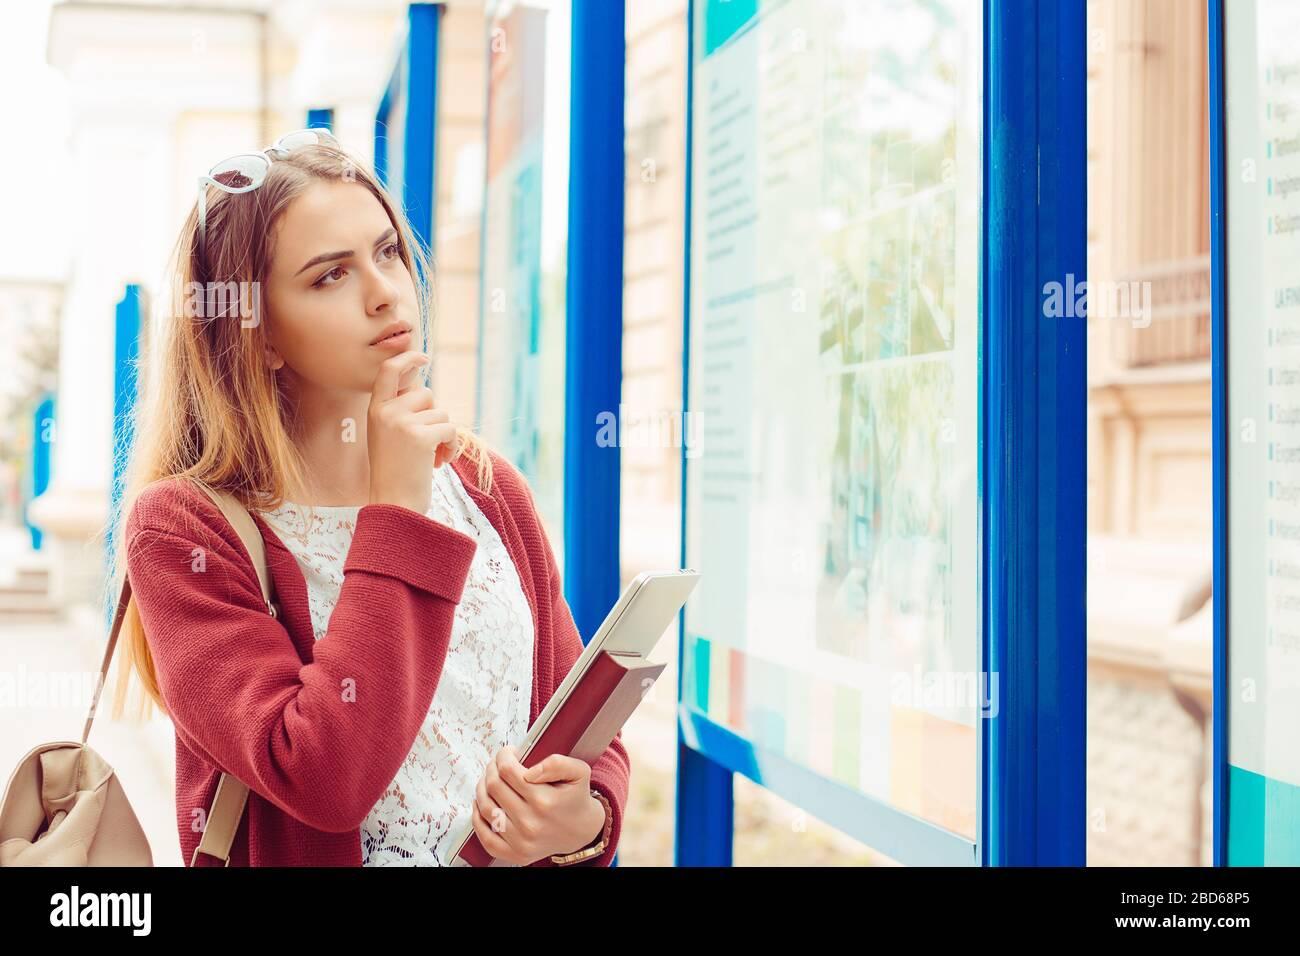 Девушка студентка работа онлайн кастинг модельное агентство